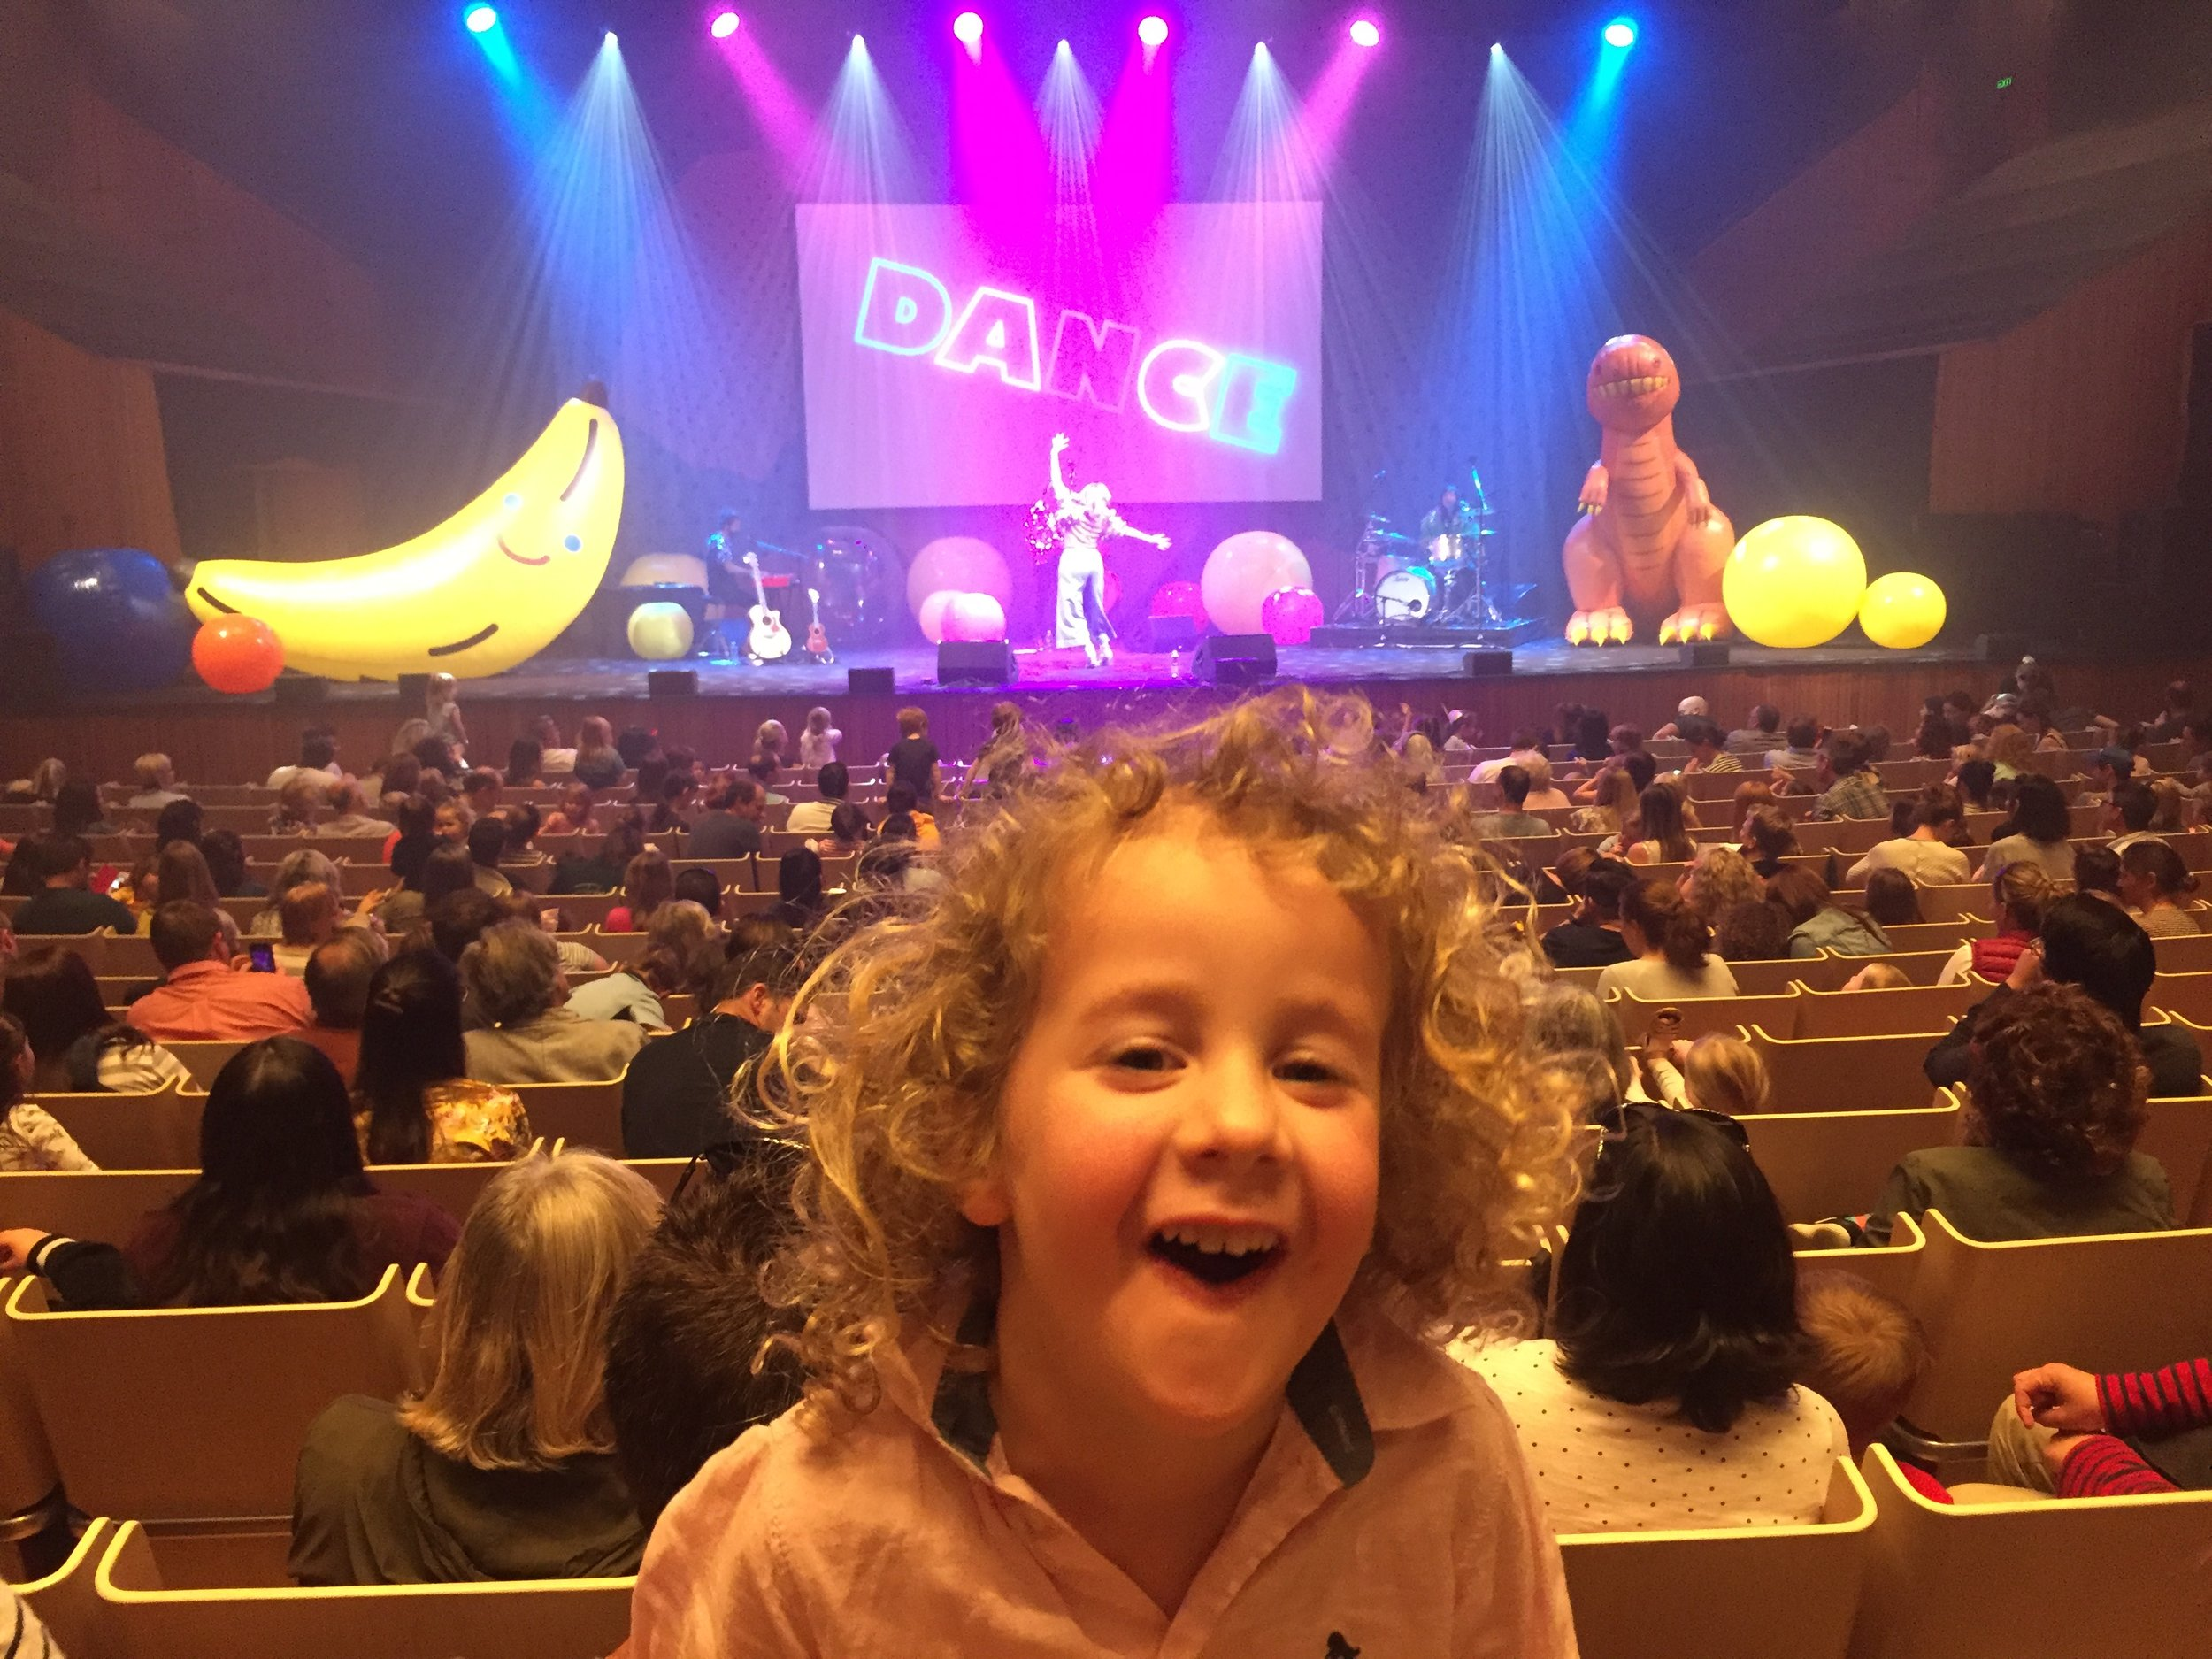 Noah at the Justine Clarke concert